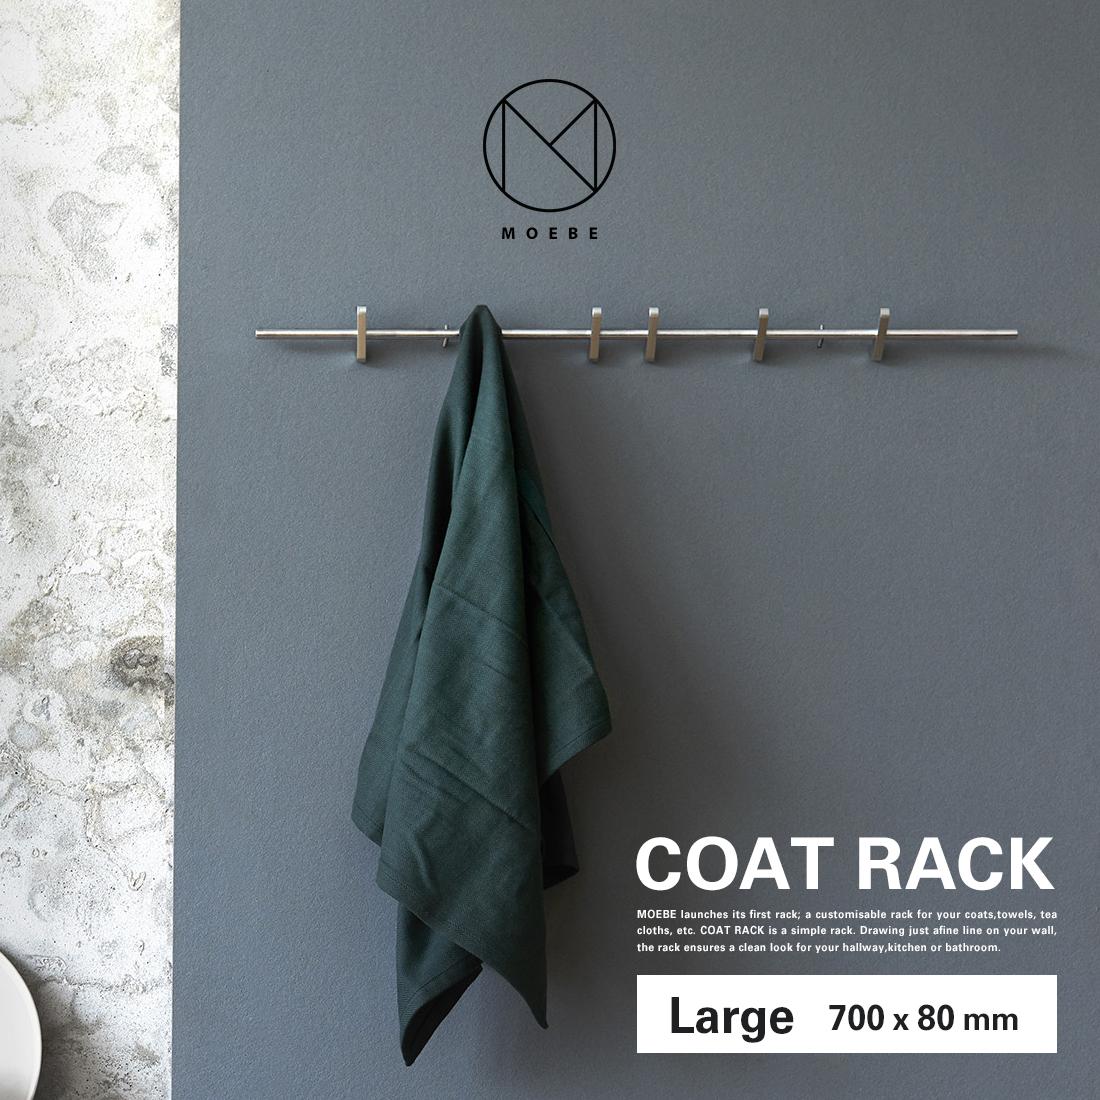 【MOEBE】COAT RACK L 70cm ムーベコートラック コートハンガー 壁掛け 玄関収納 スチール steel